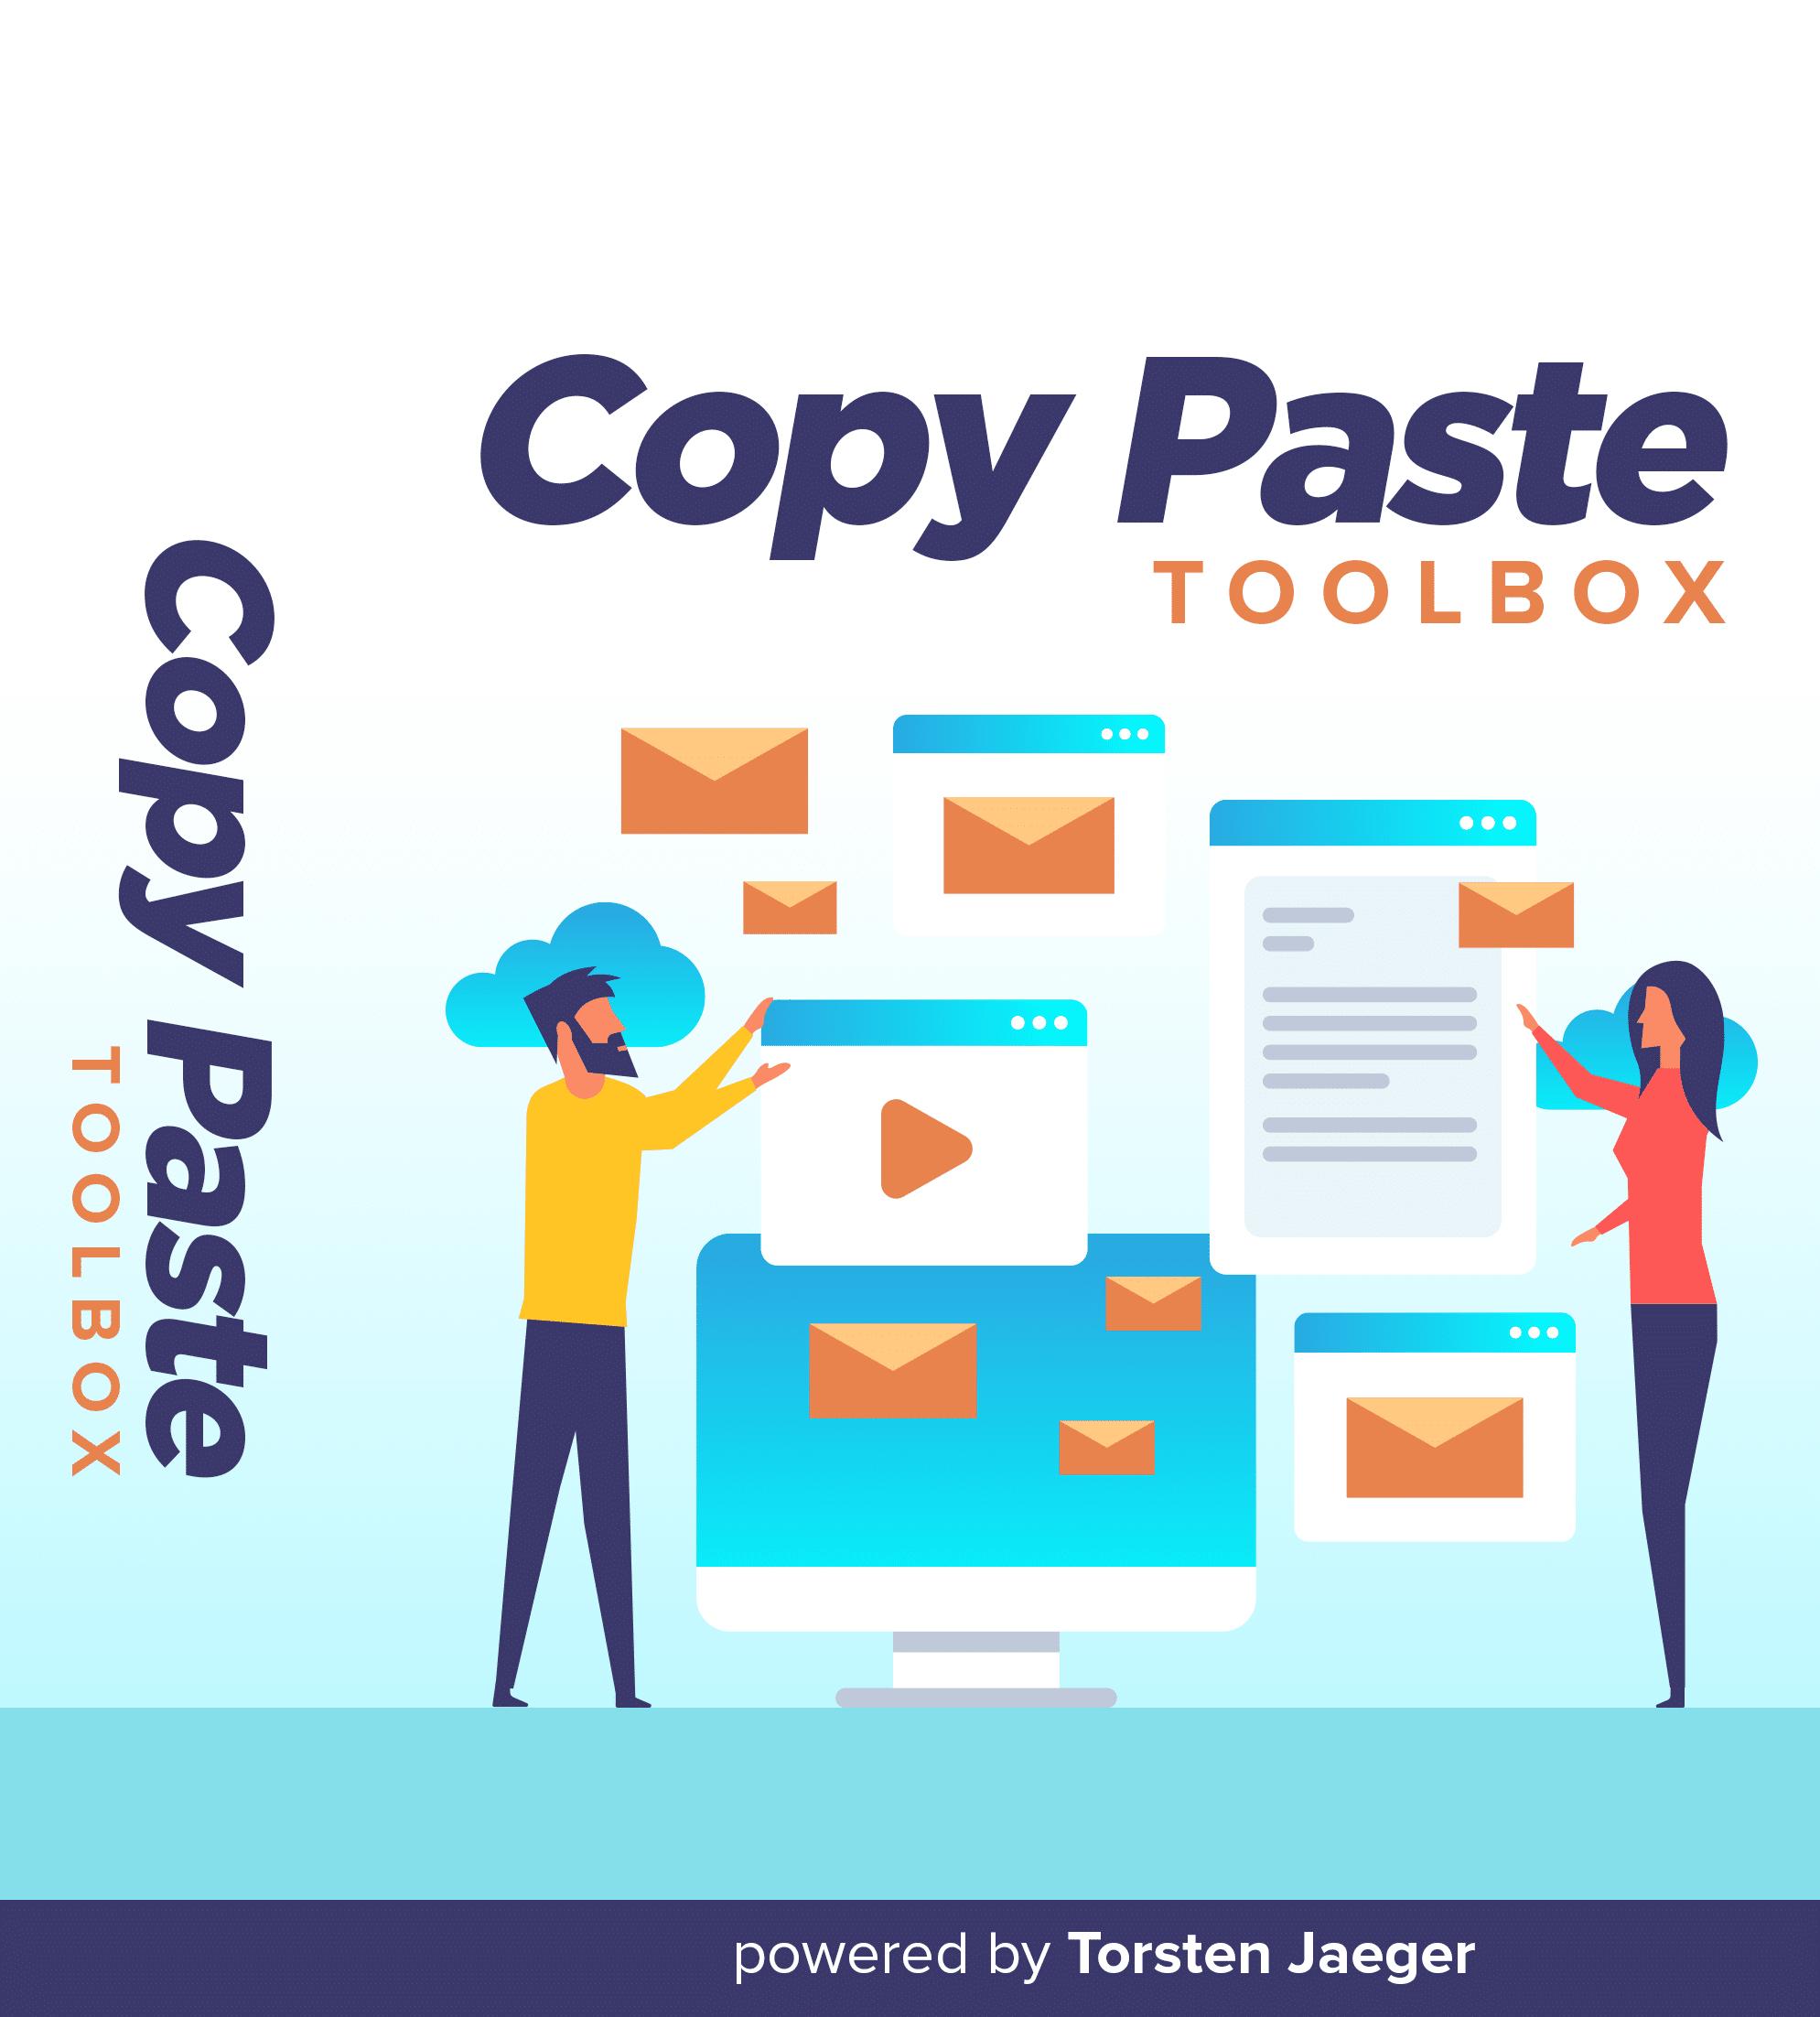 Copy Paste Toolbox